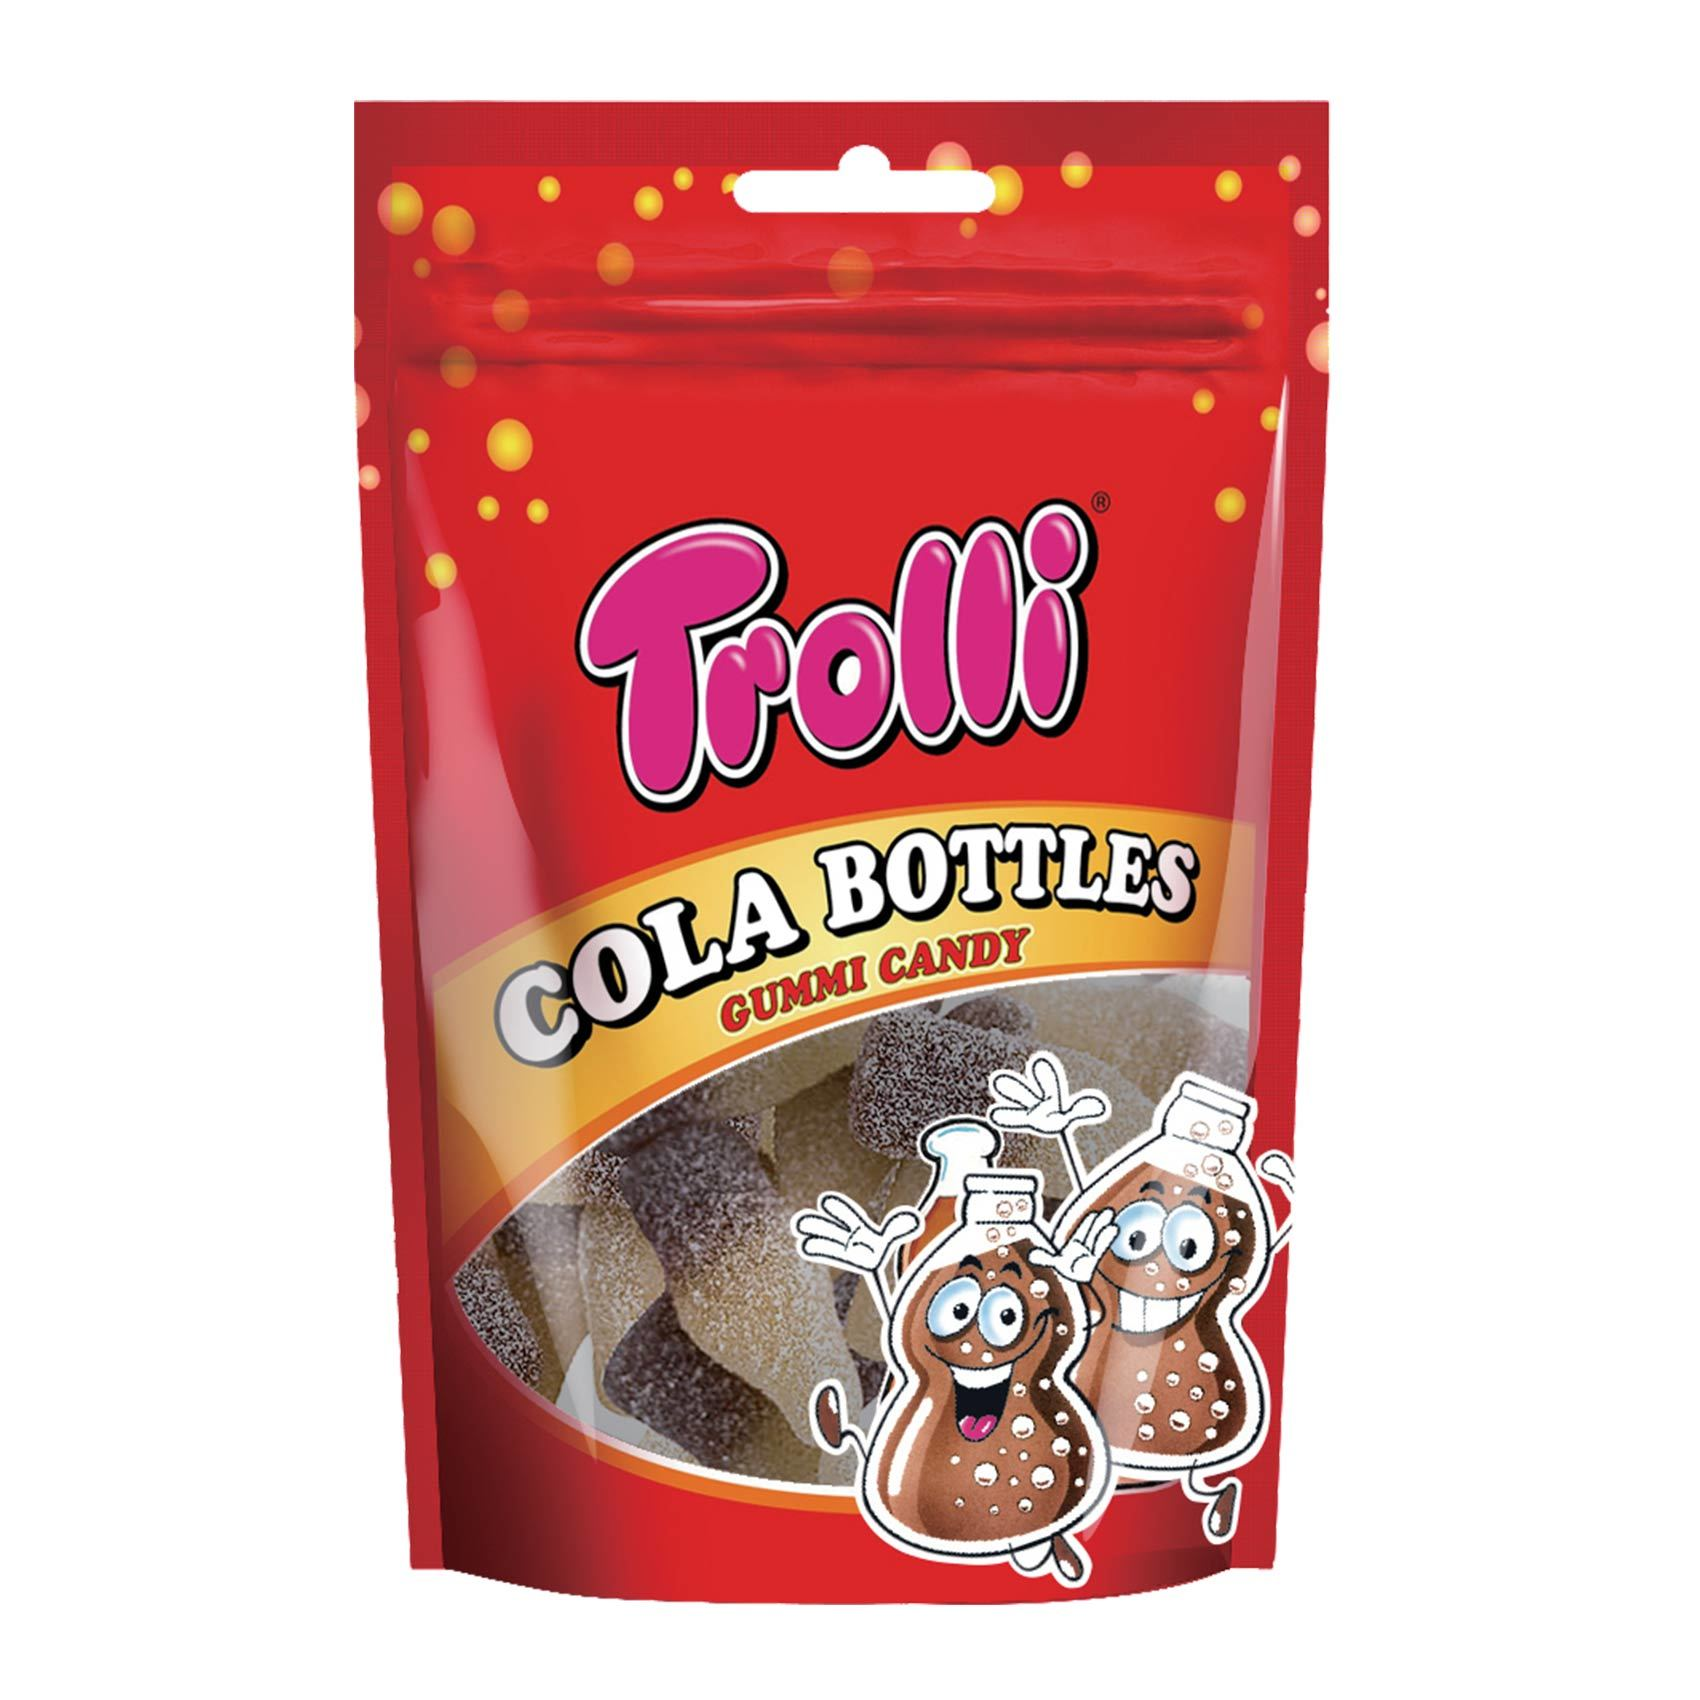 Buy Trolli Cola Bottles Gummi Candy 100 G Online Shop Food Cupboard On Carrefour Saudi Arabia